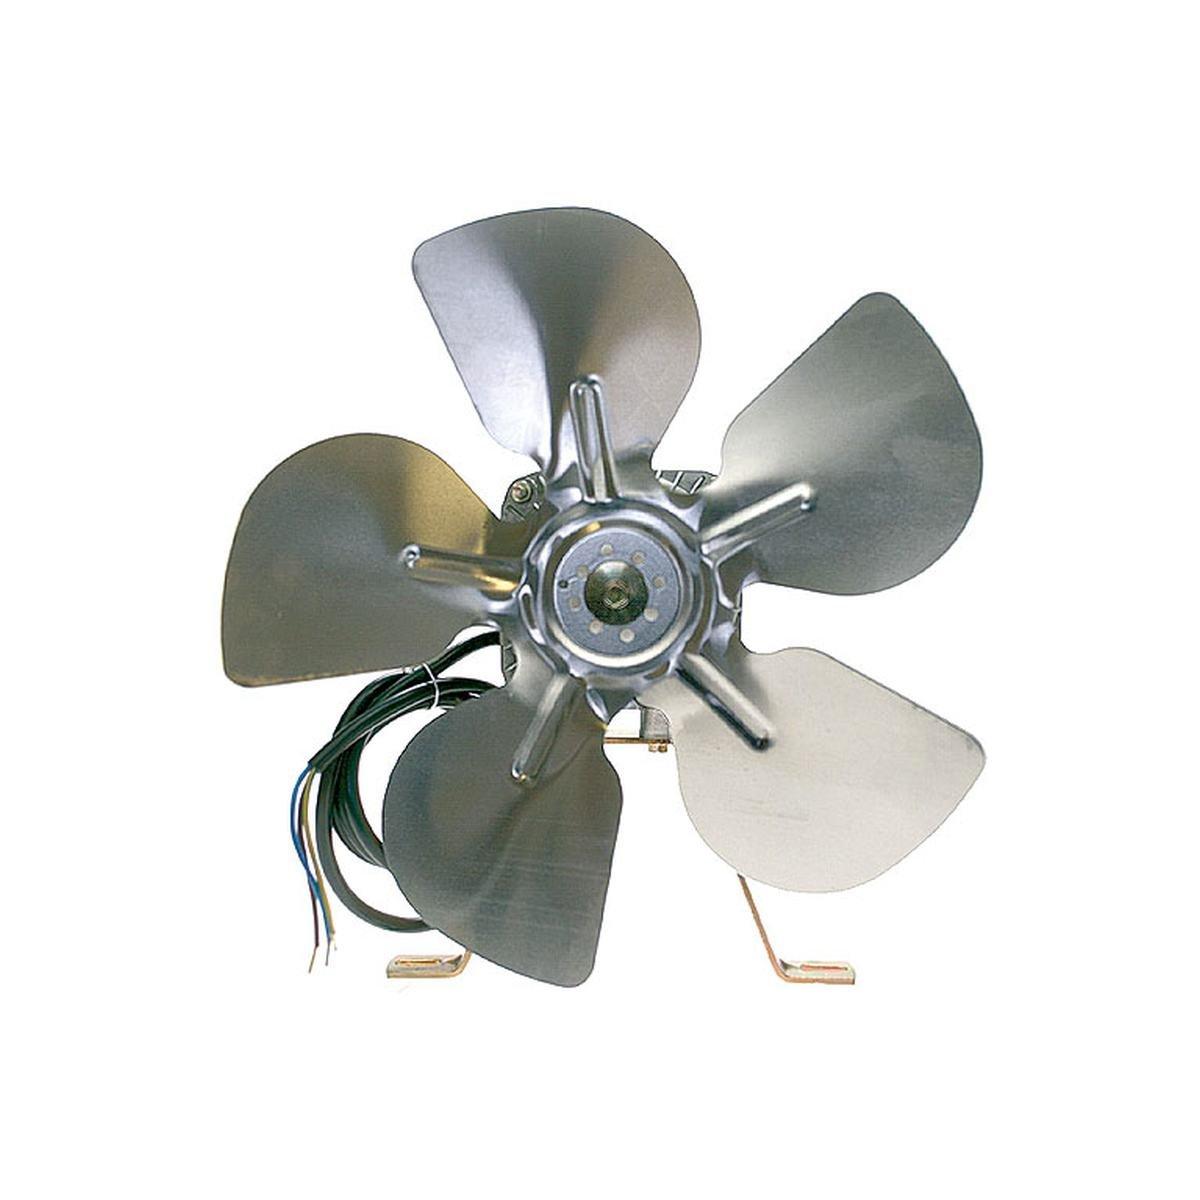 Ventilator 5W med vingediameter 200 mm. - Elco